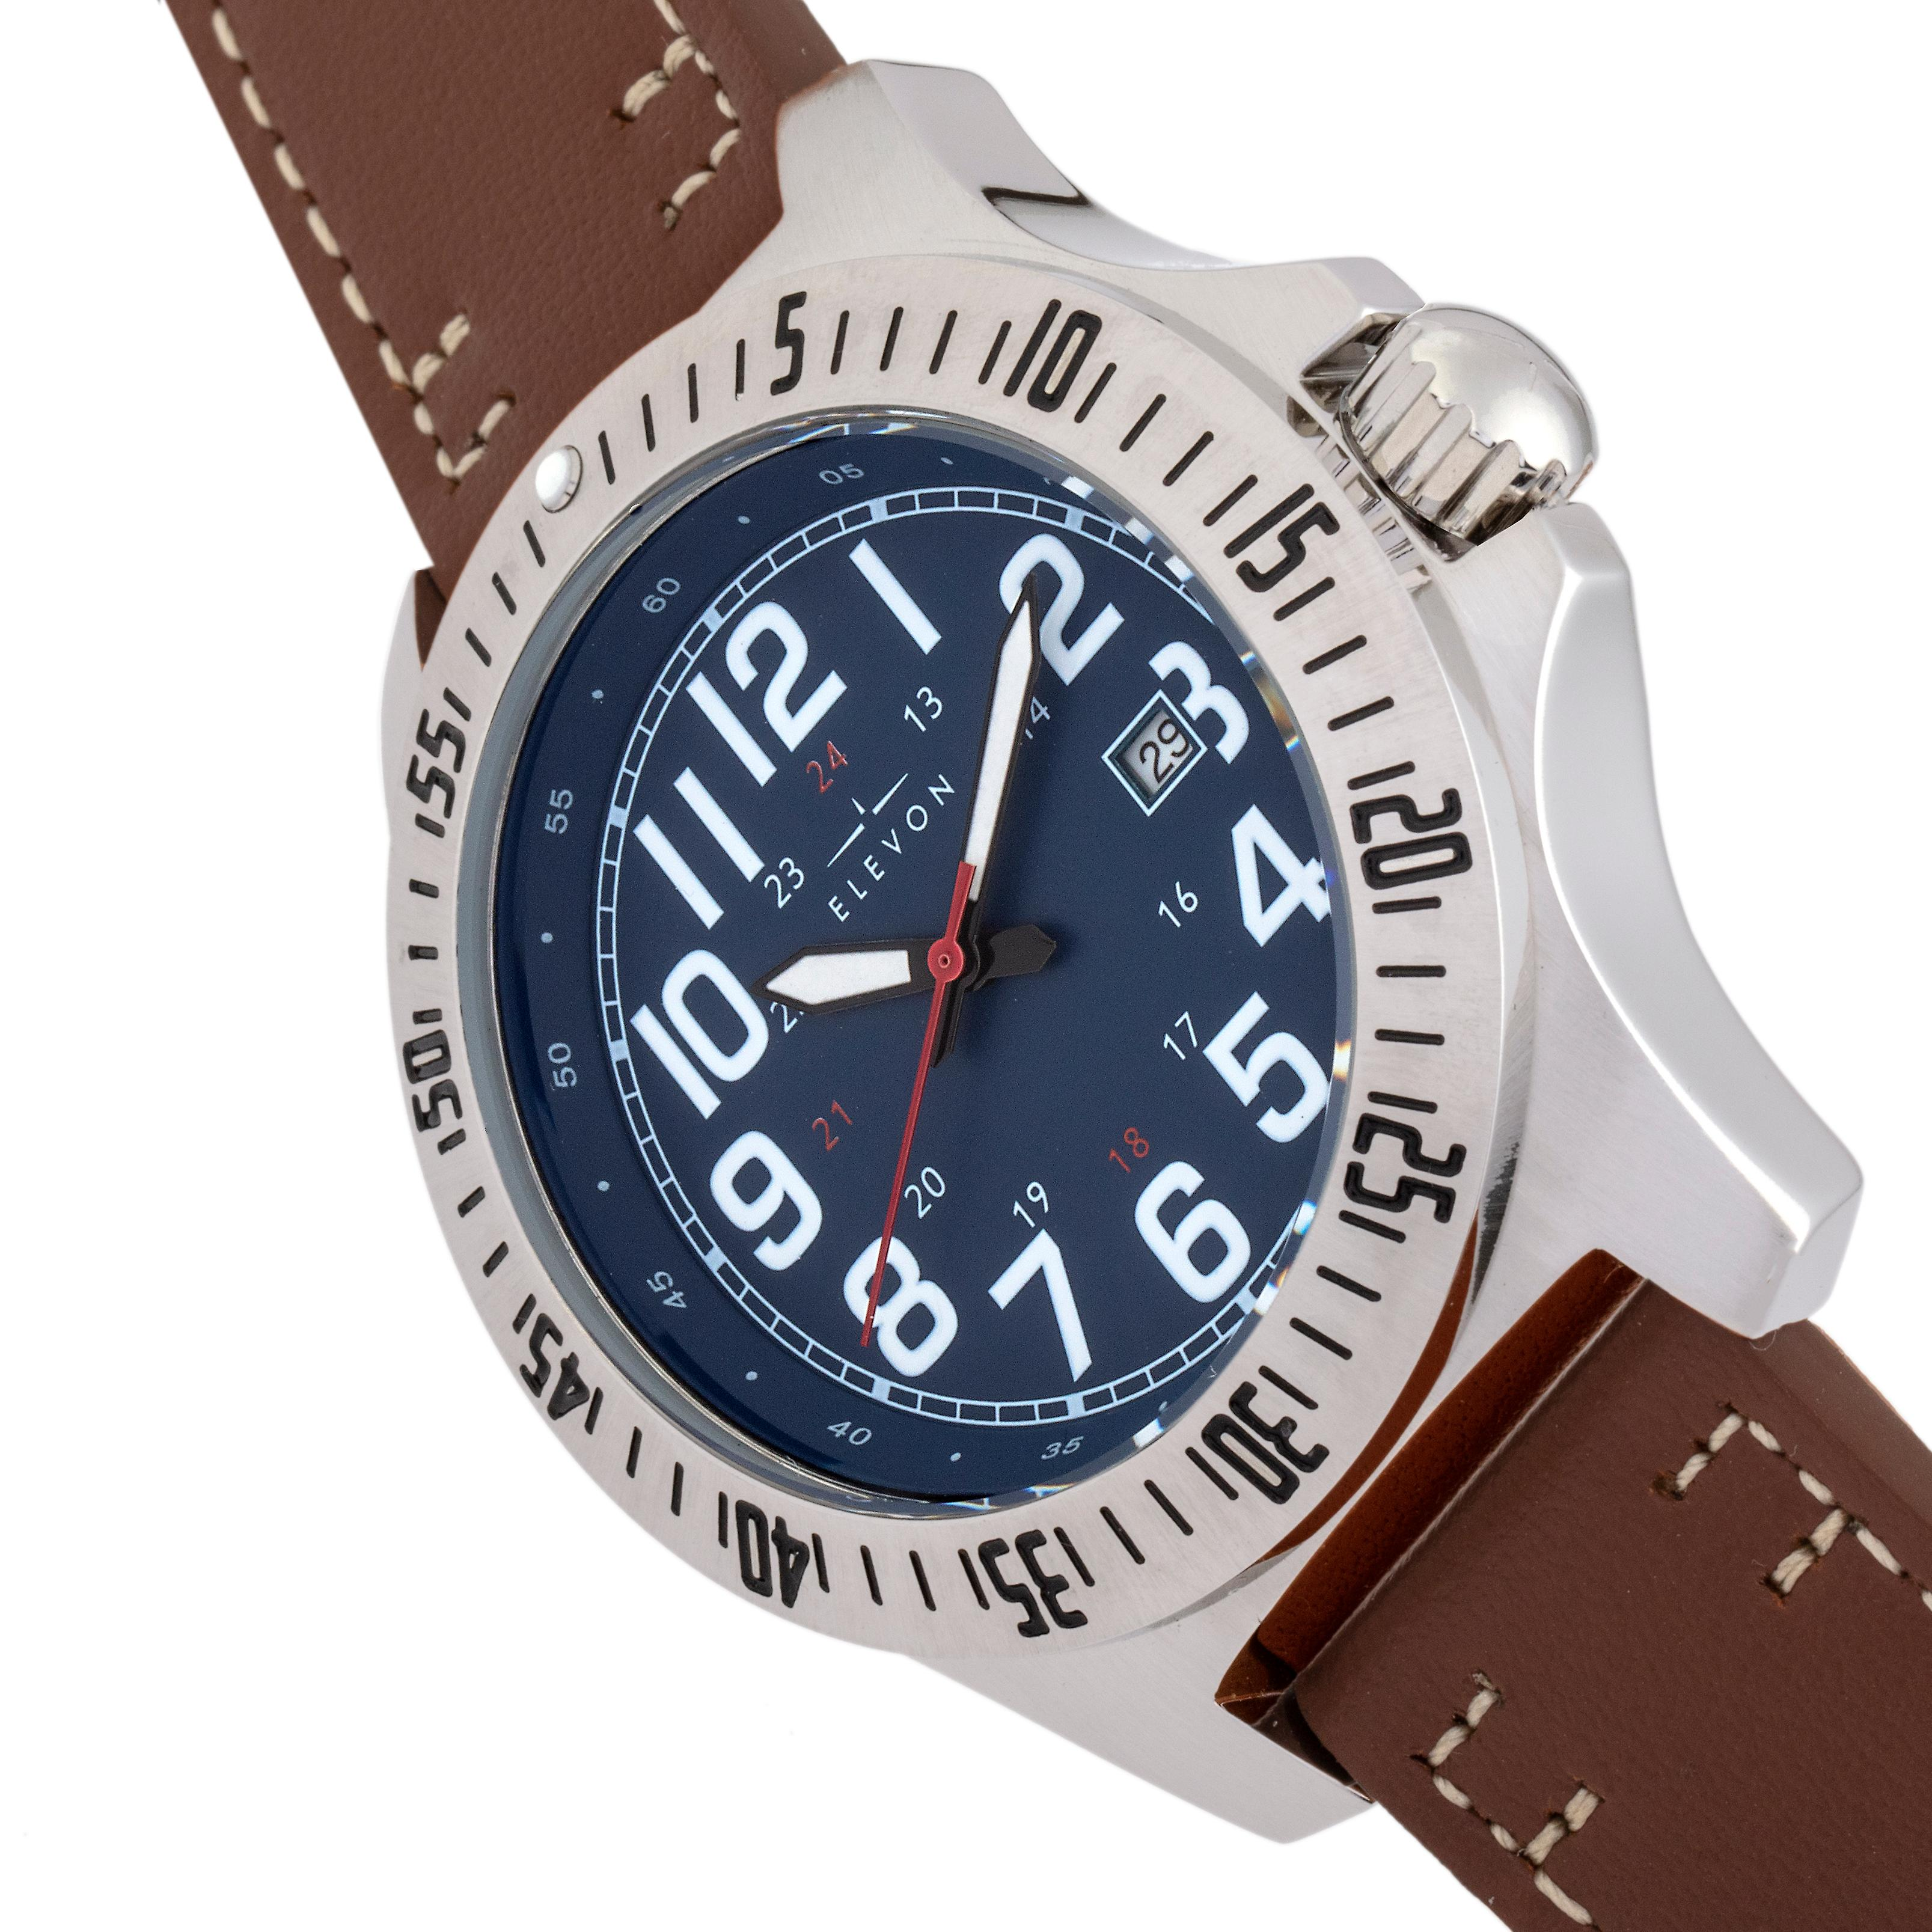 Elevon Aviator Leather-Band Watch w/Date - Brown/Blue